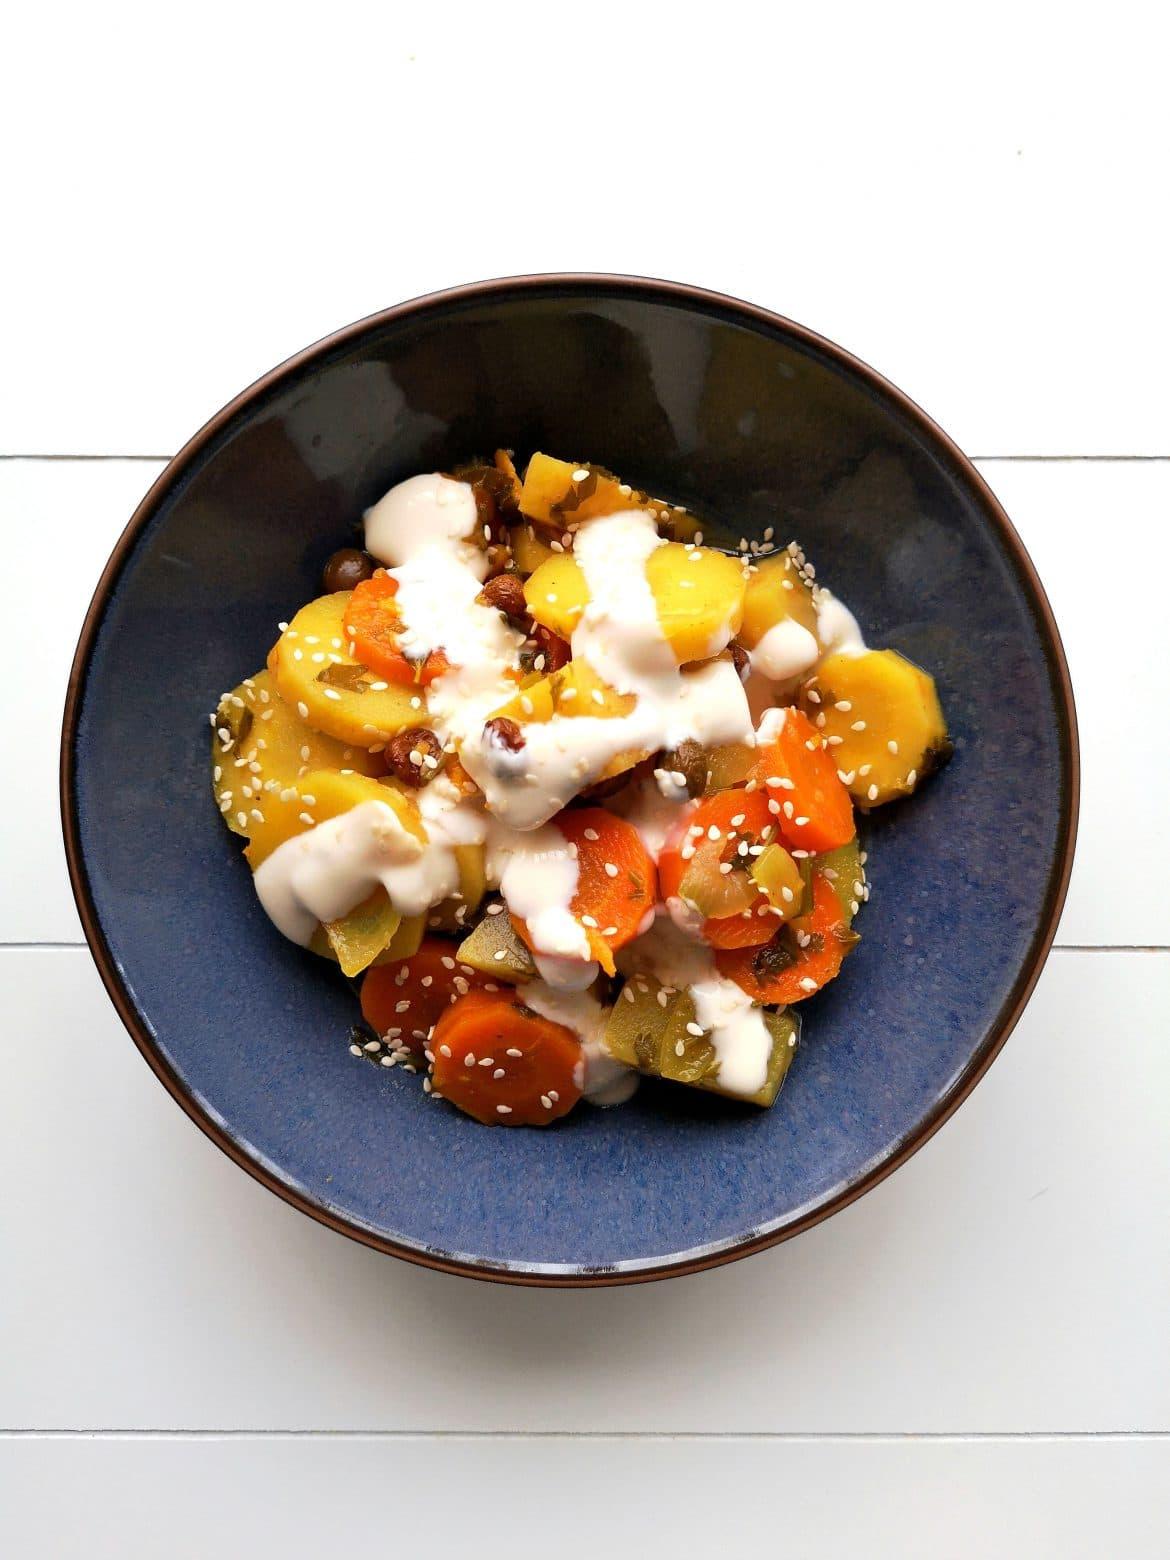 spicy root vegetables